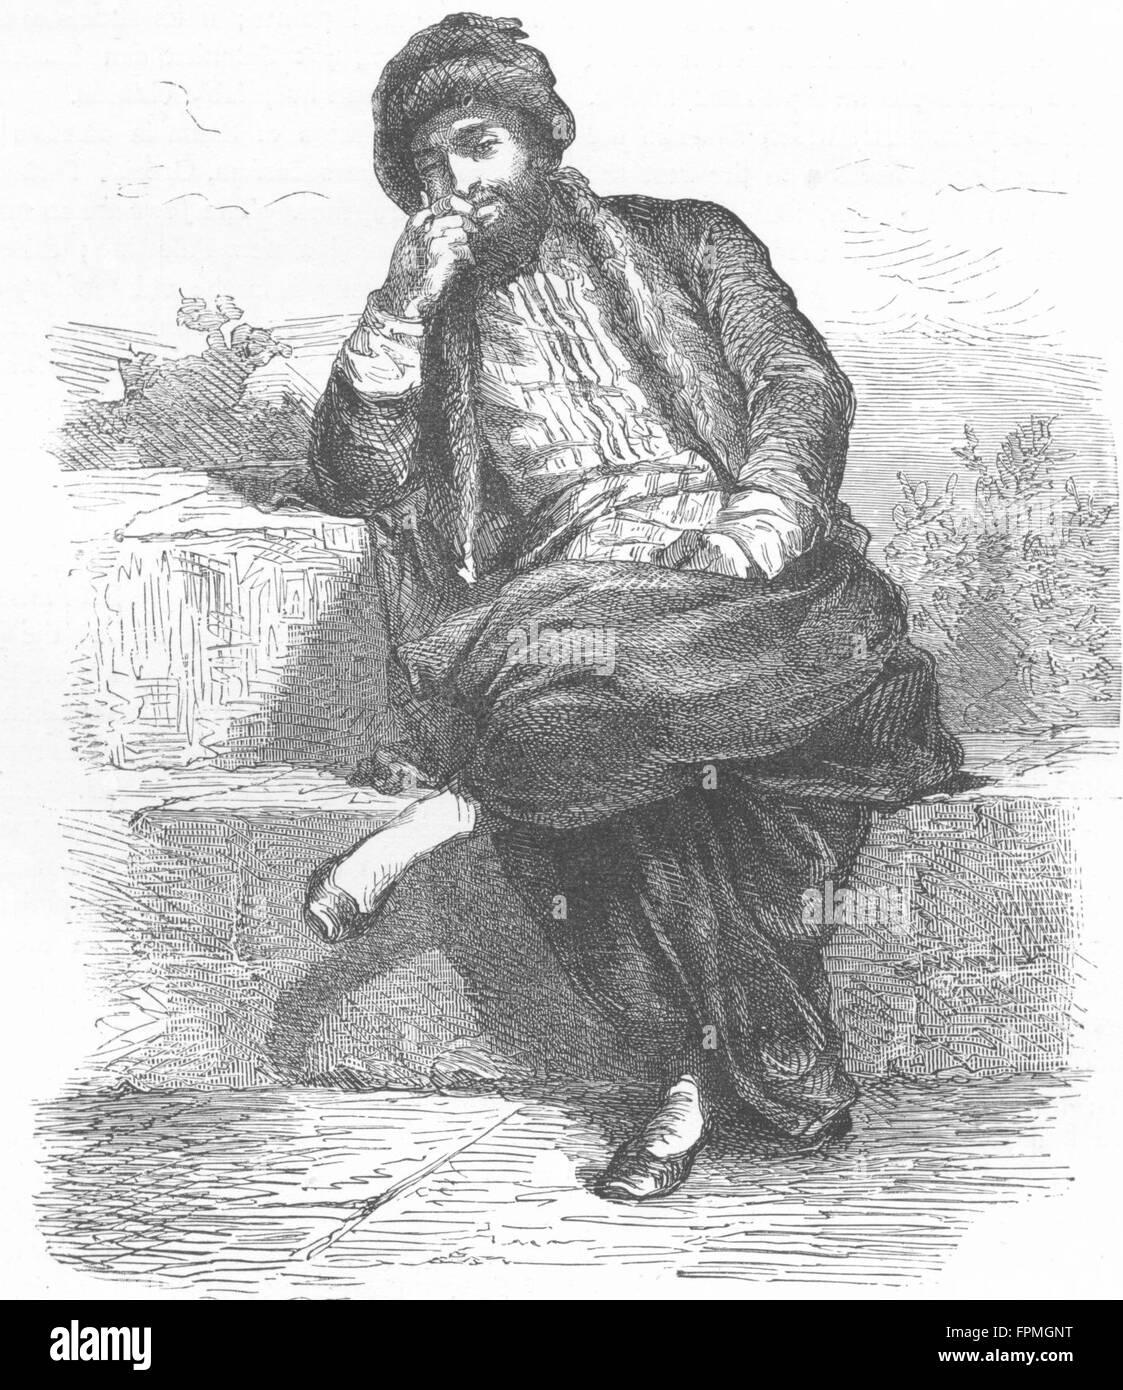 GREECE: Jew of Thessaloniki, antique print 1880 - Stock Image